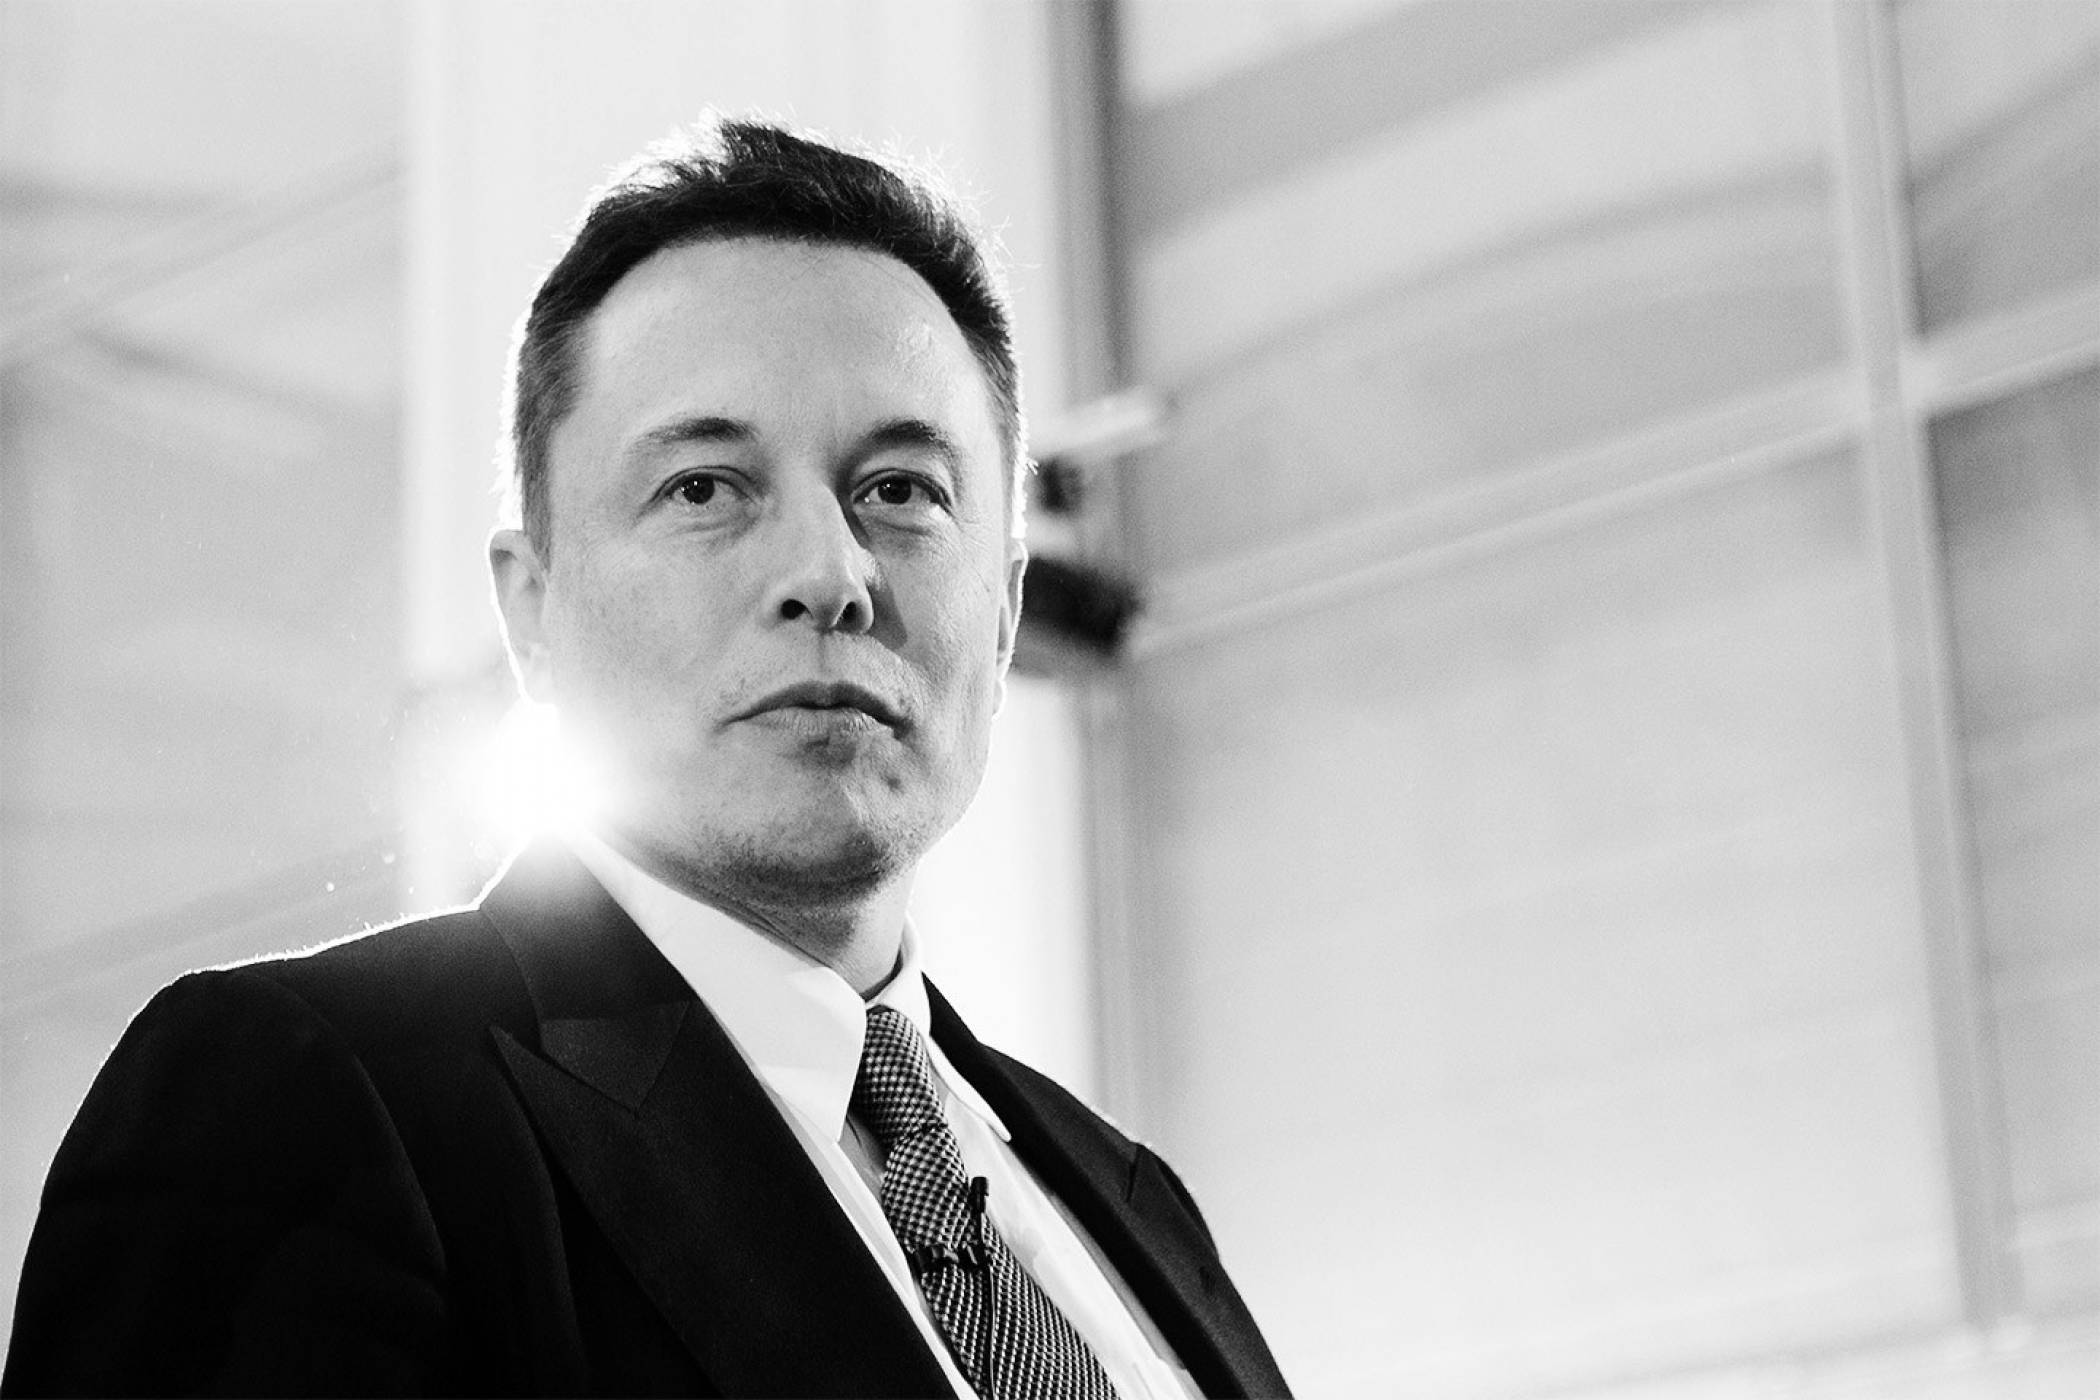 giá bitcoin: Elon Musk tiếp tục đăng tweet công khai ủng hộ Dogecoin